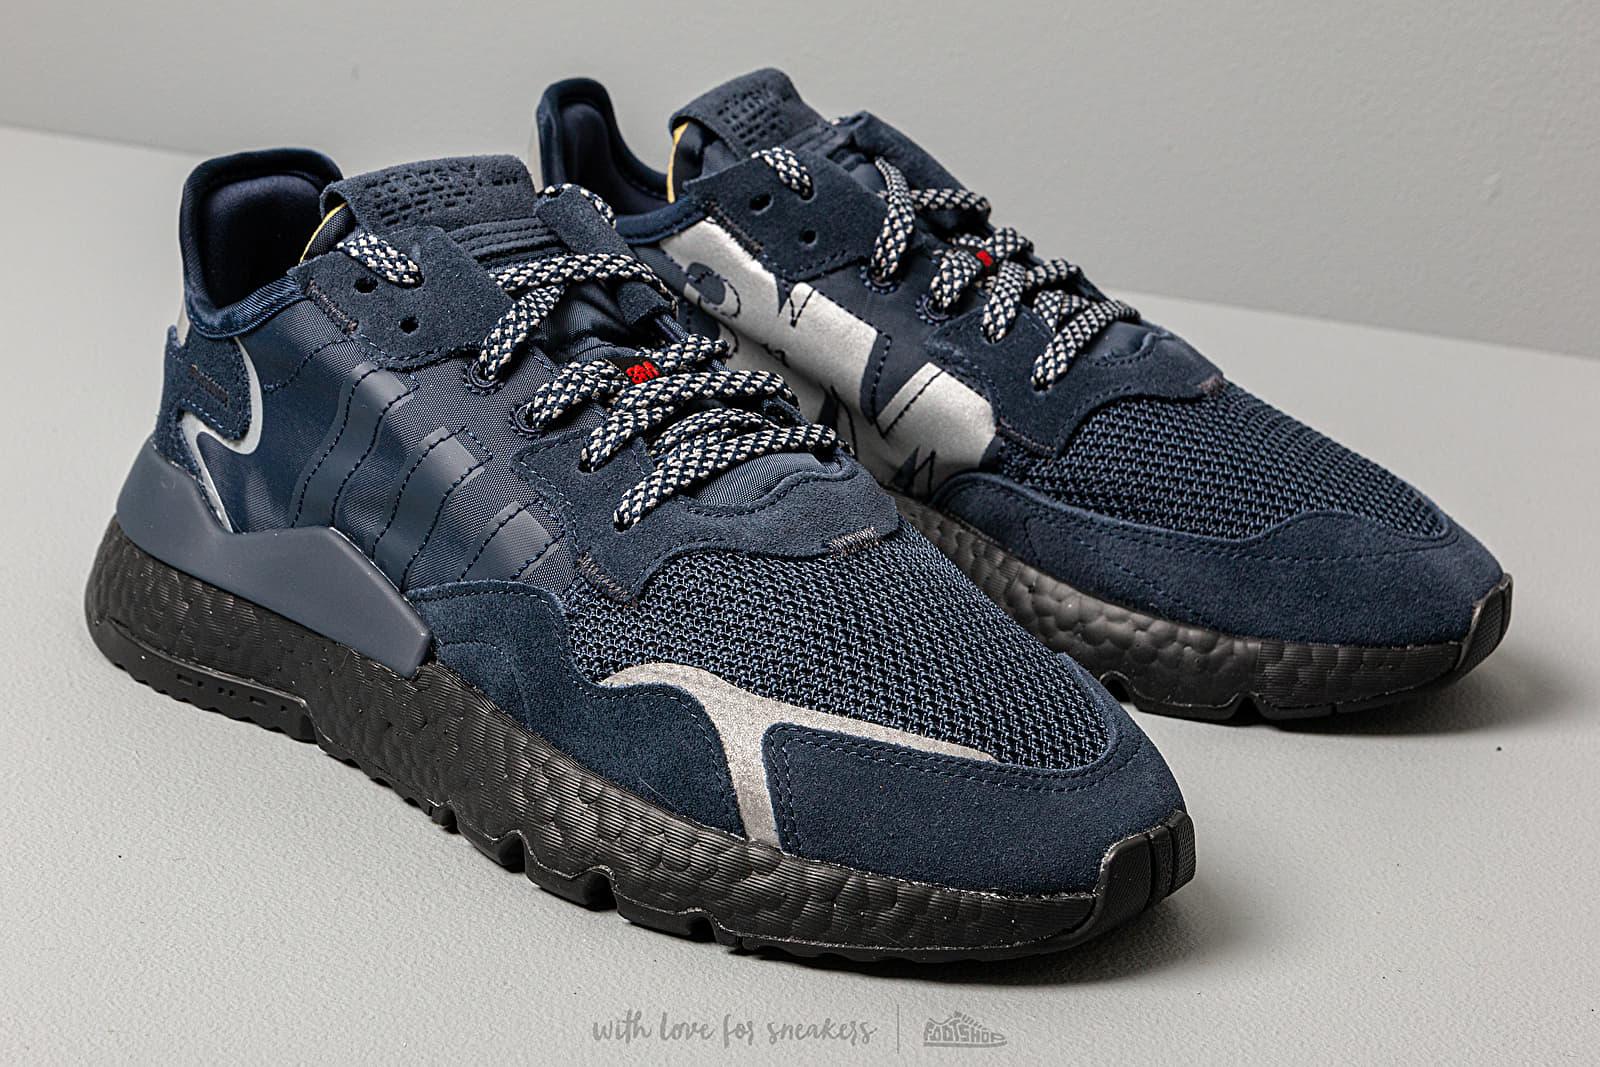 adidas Nite Jogger 3M Collegiate Navy Collegiate Navy Core Black   Footshop